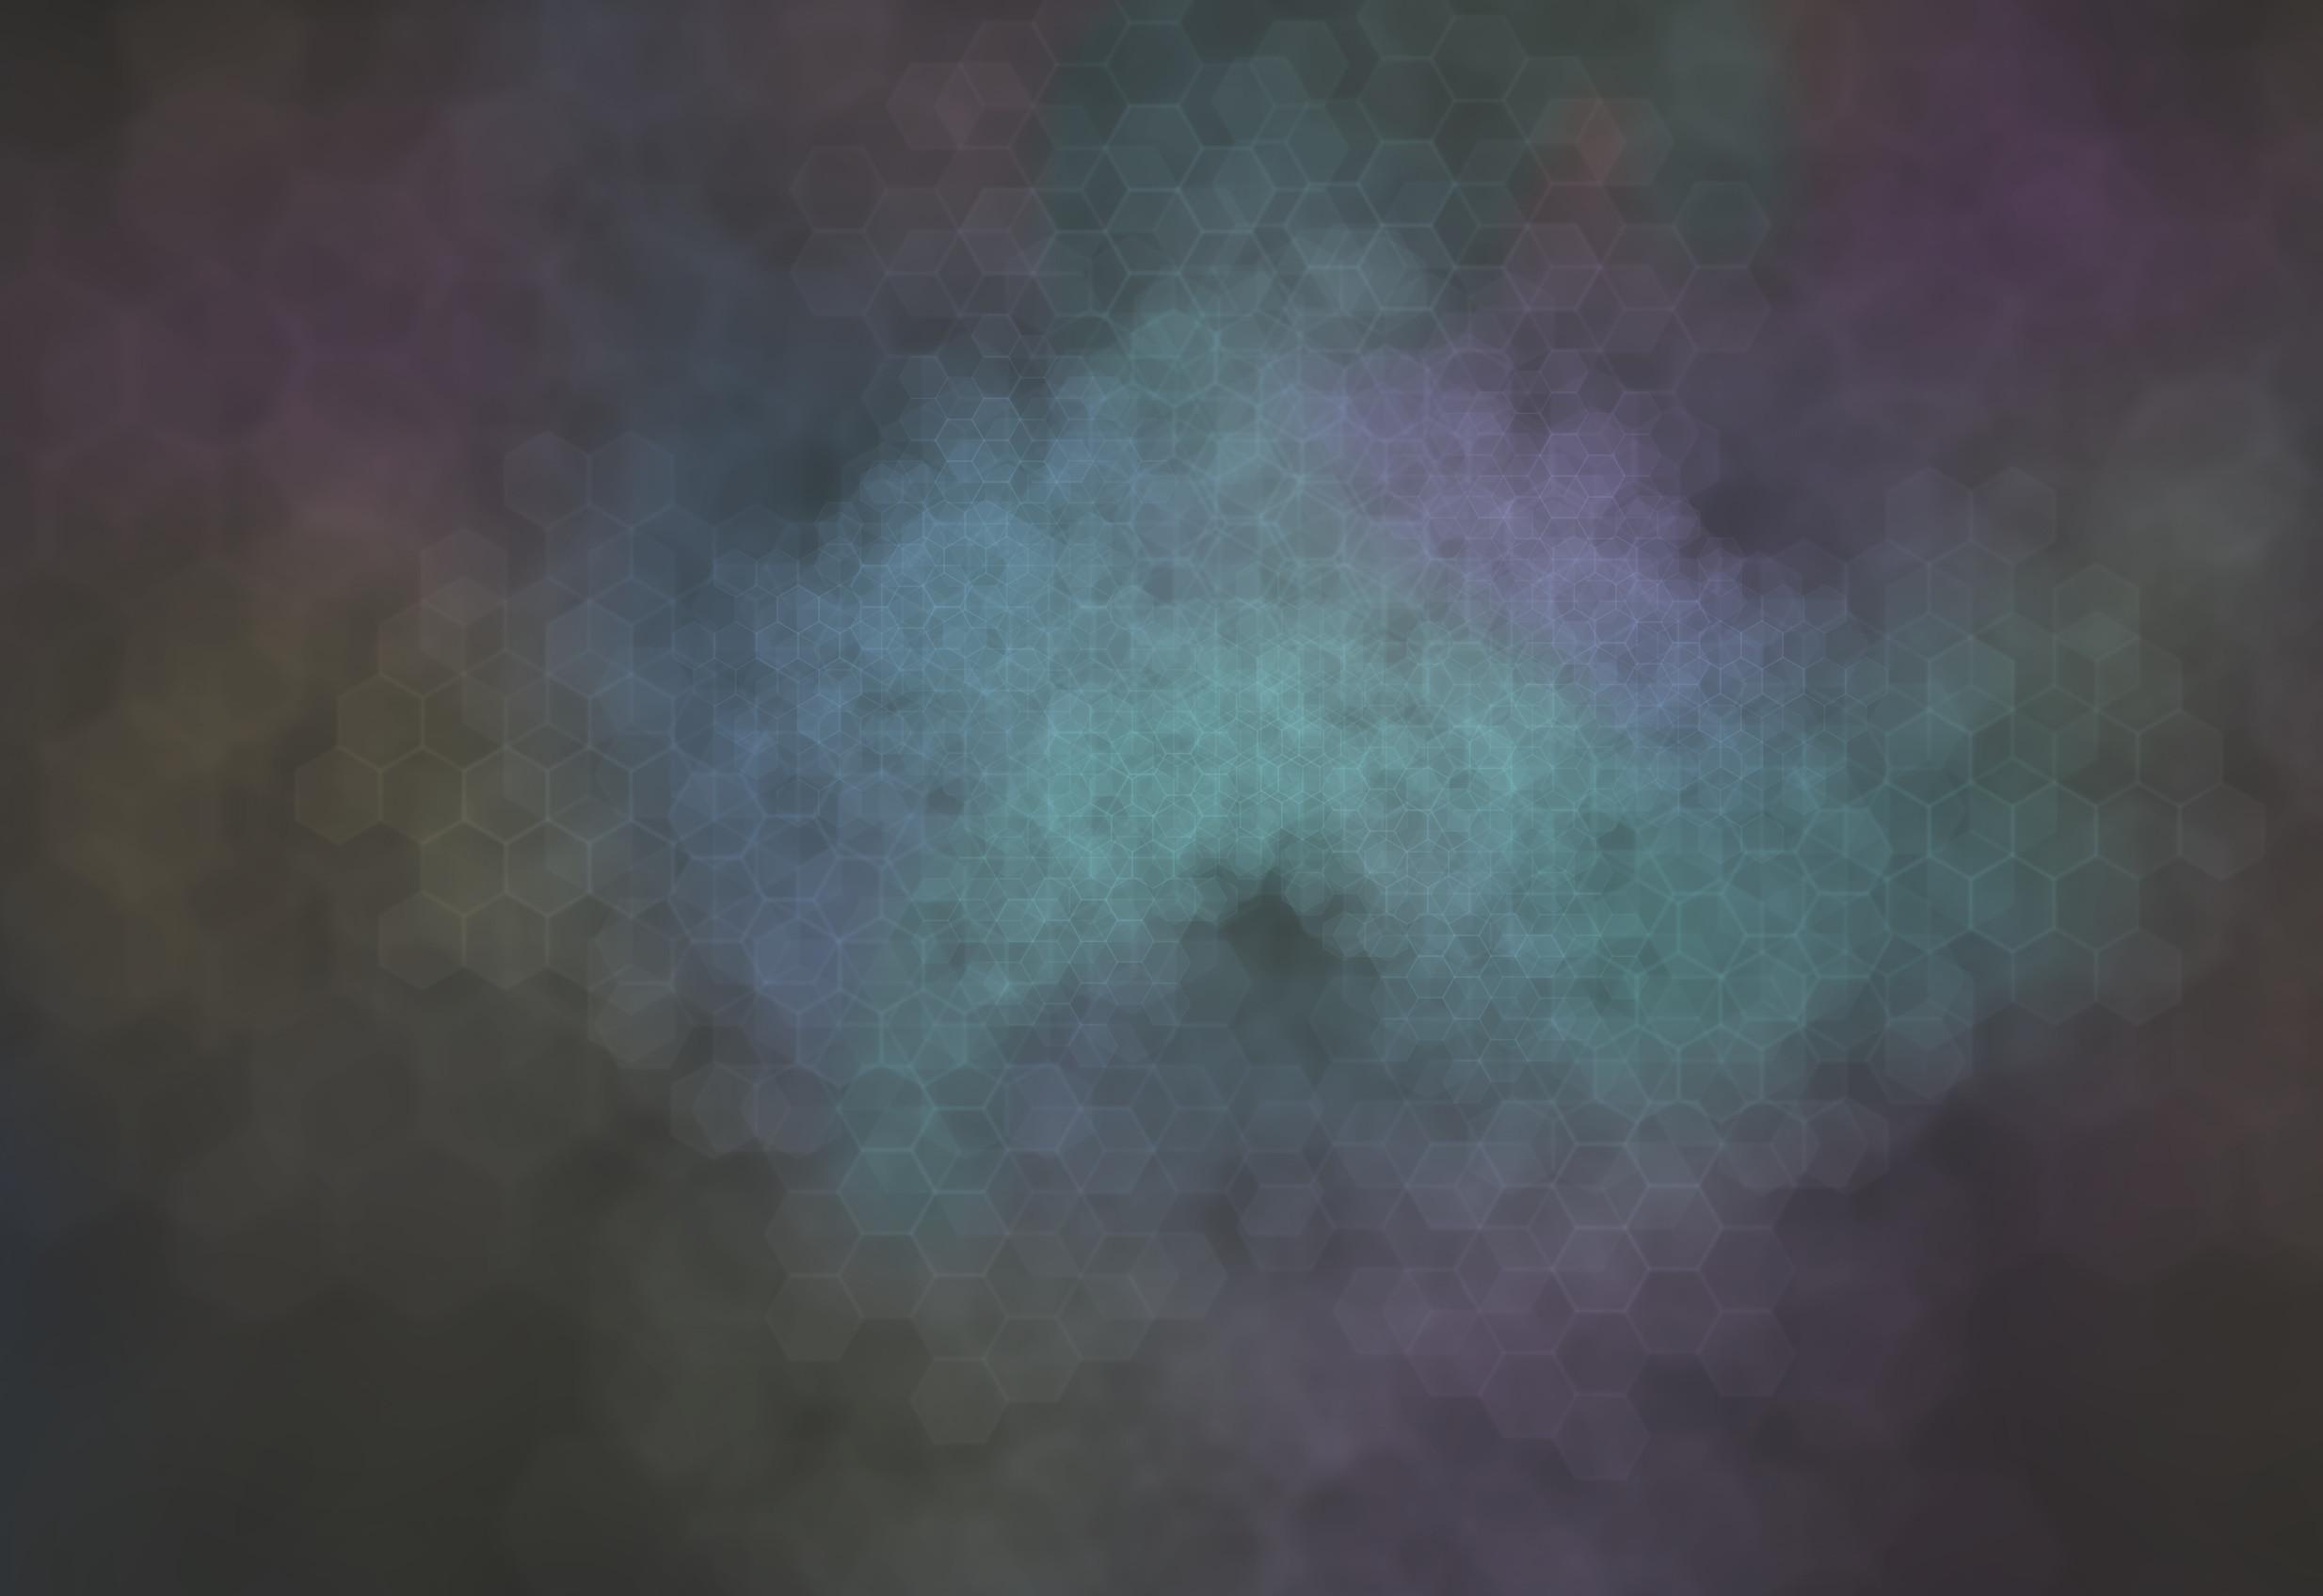 static/img/exa_clr.jpg